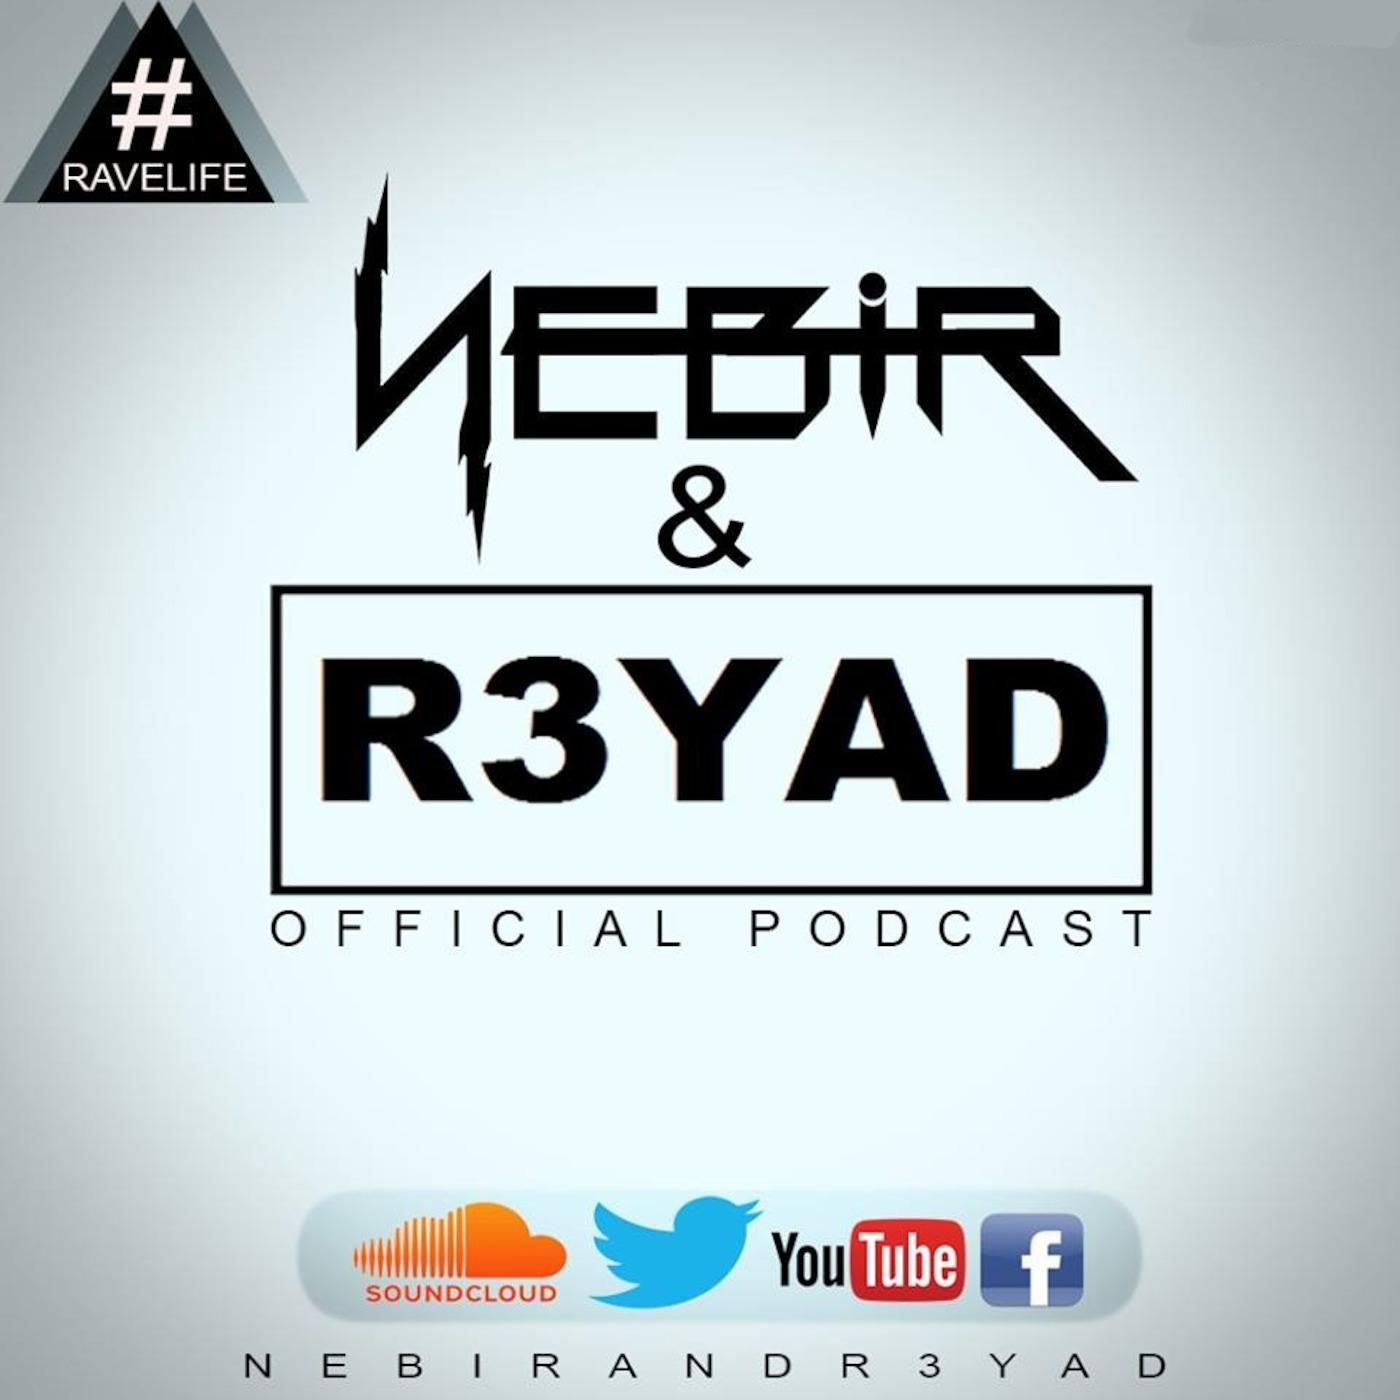 Nebir & R3YAD's Rave Life